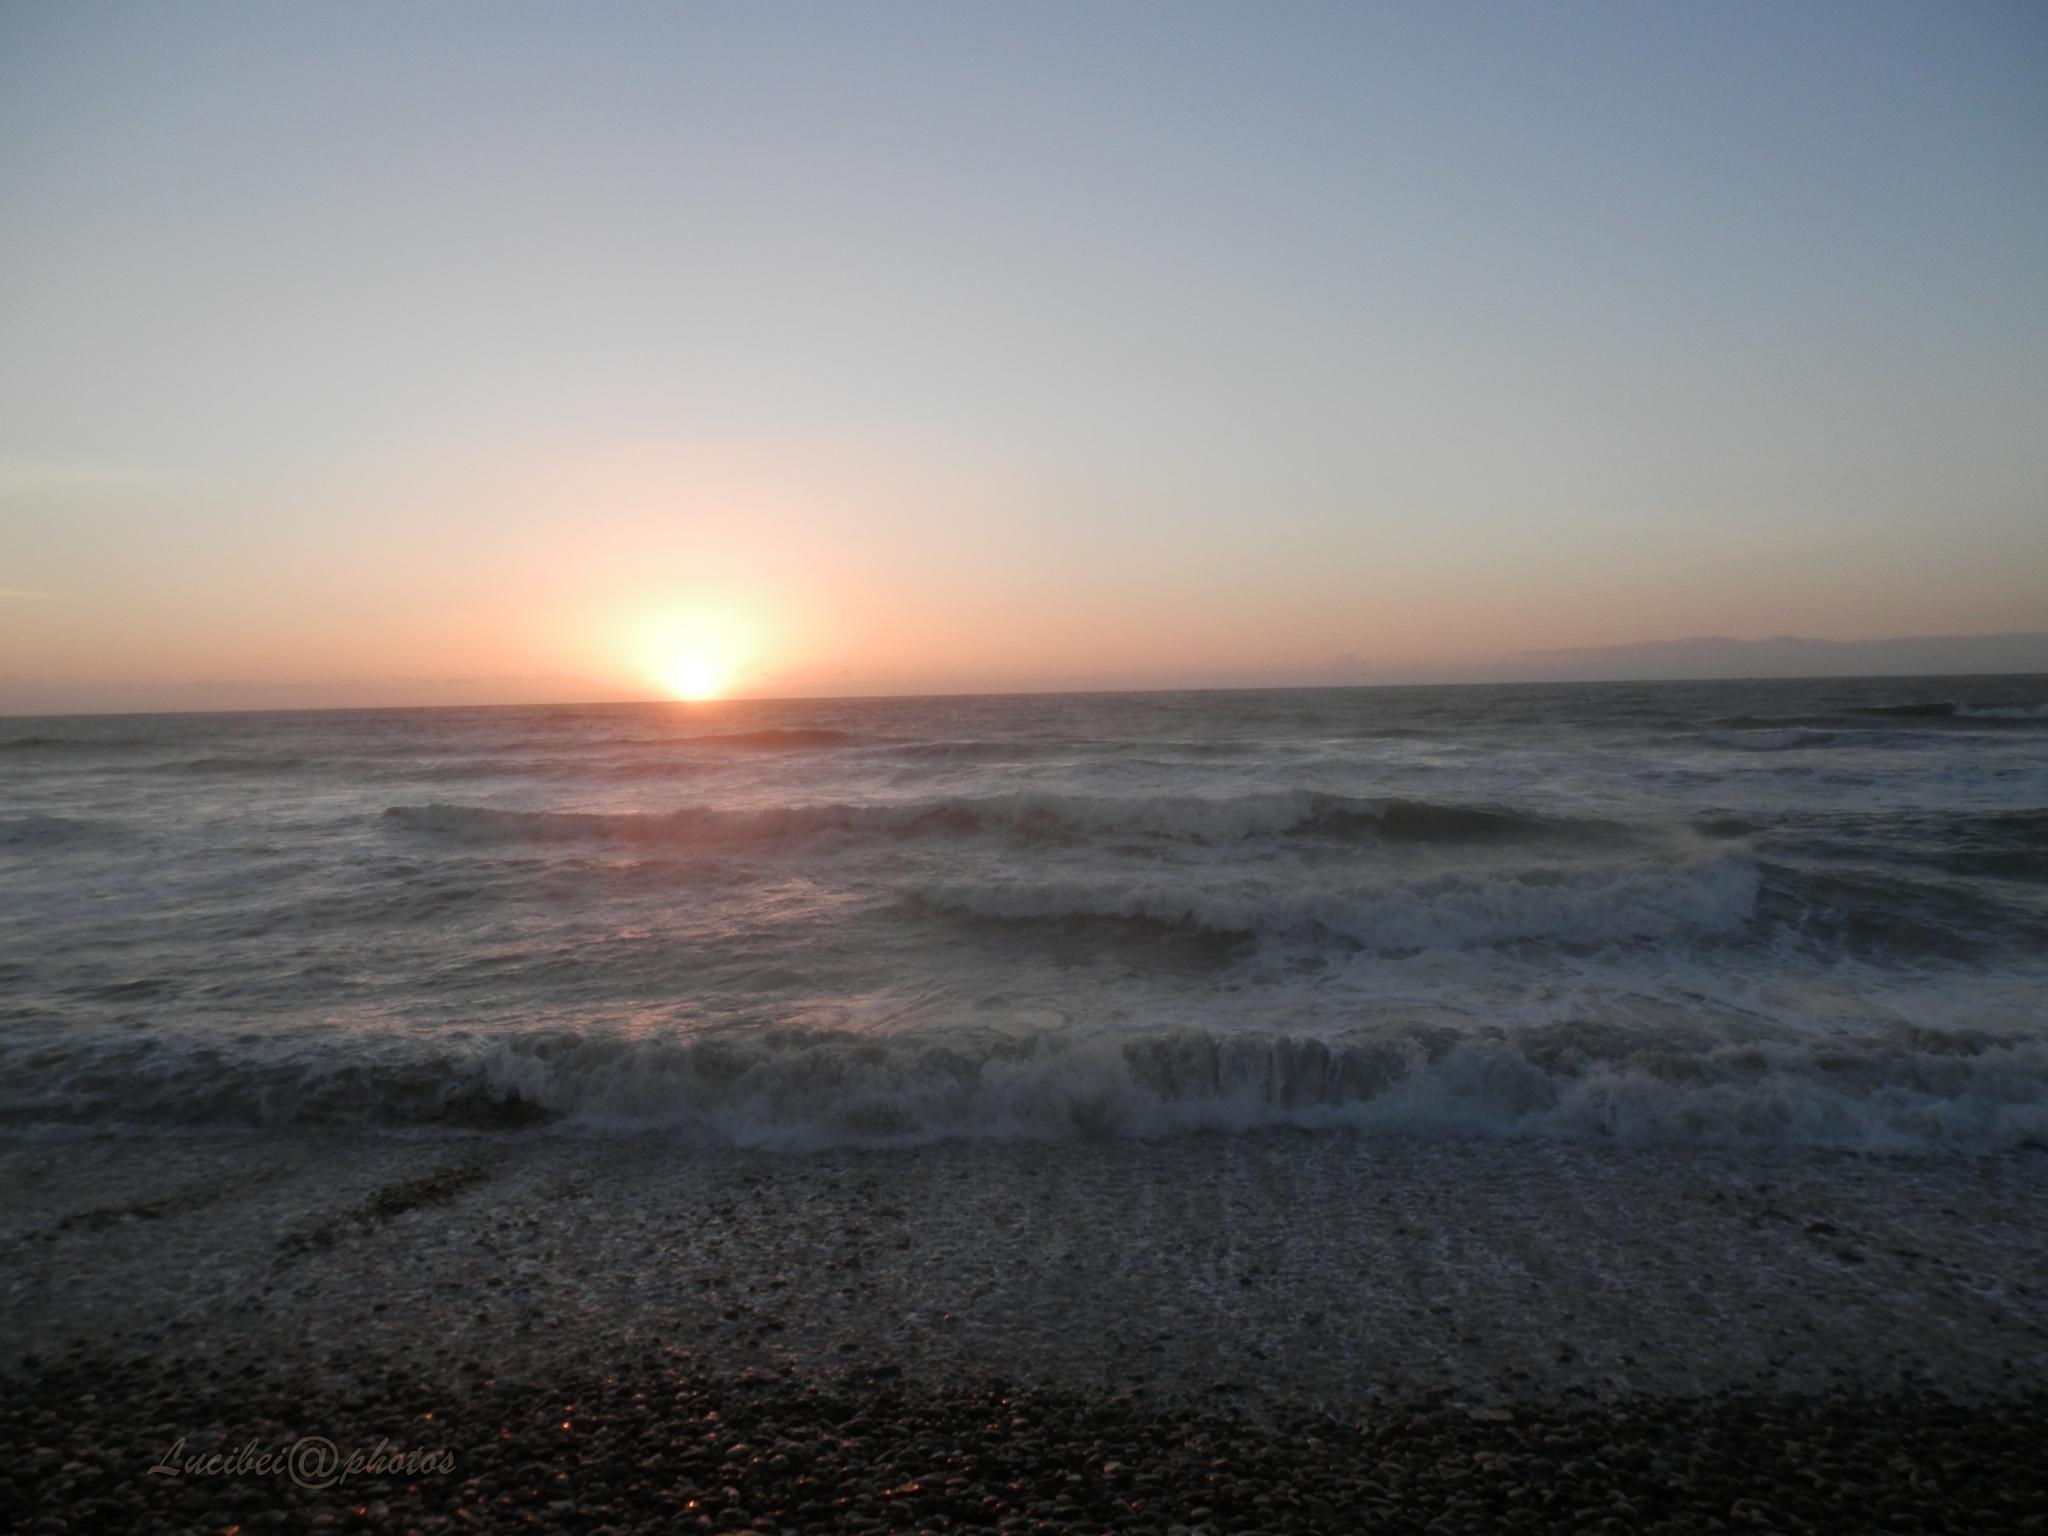 Sunset by lucia.ribeiro.33